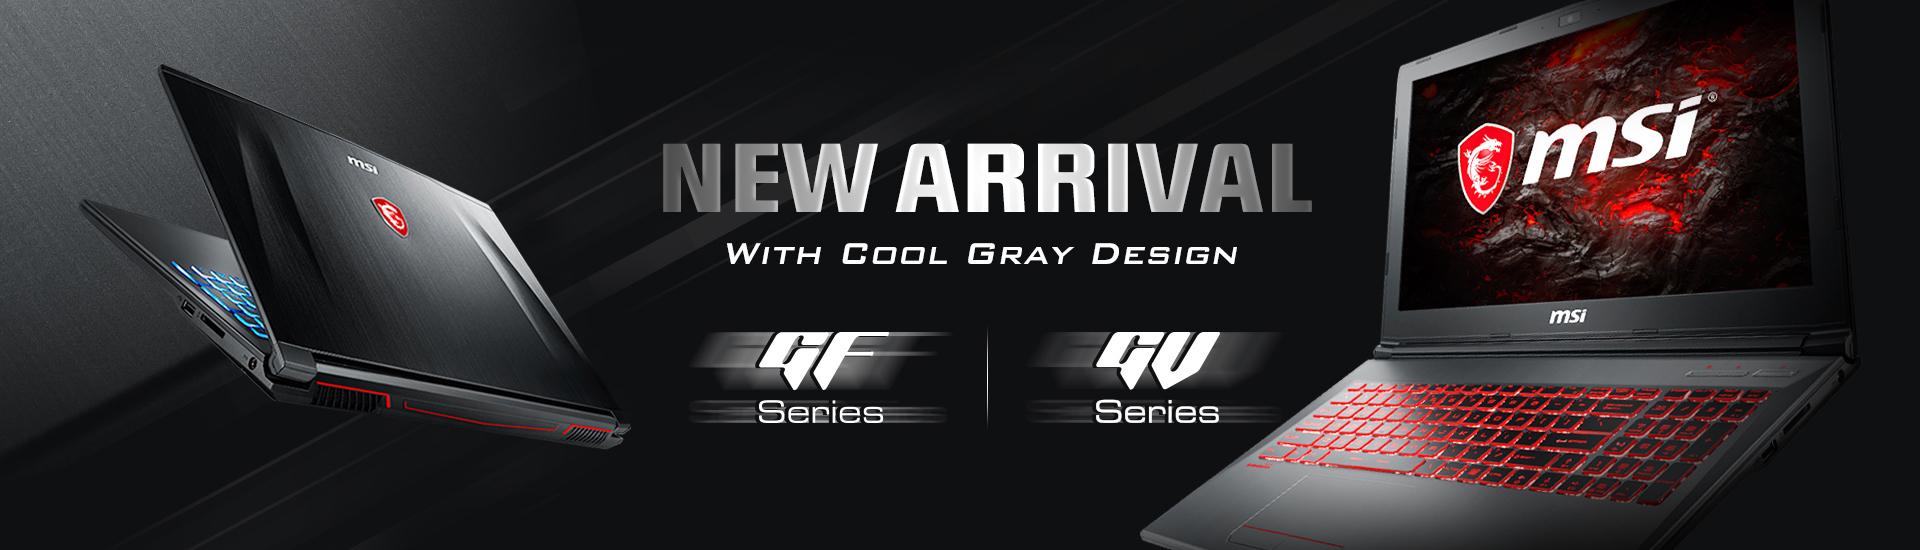 GV / GF series